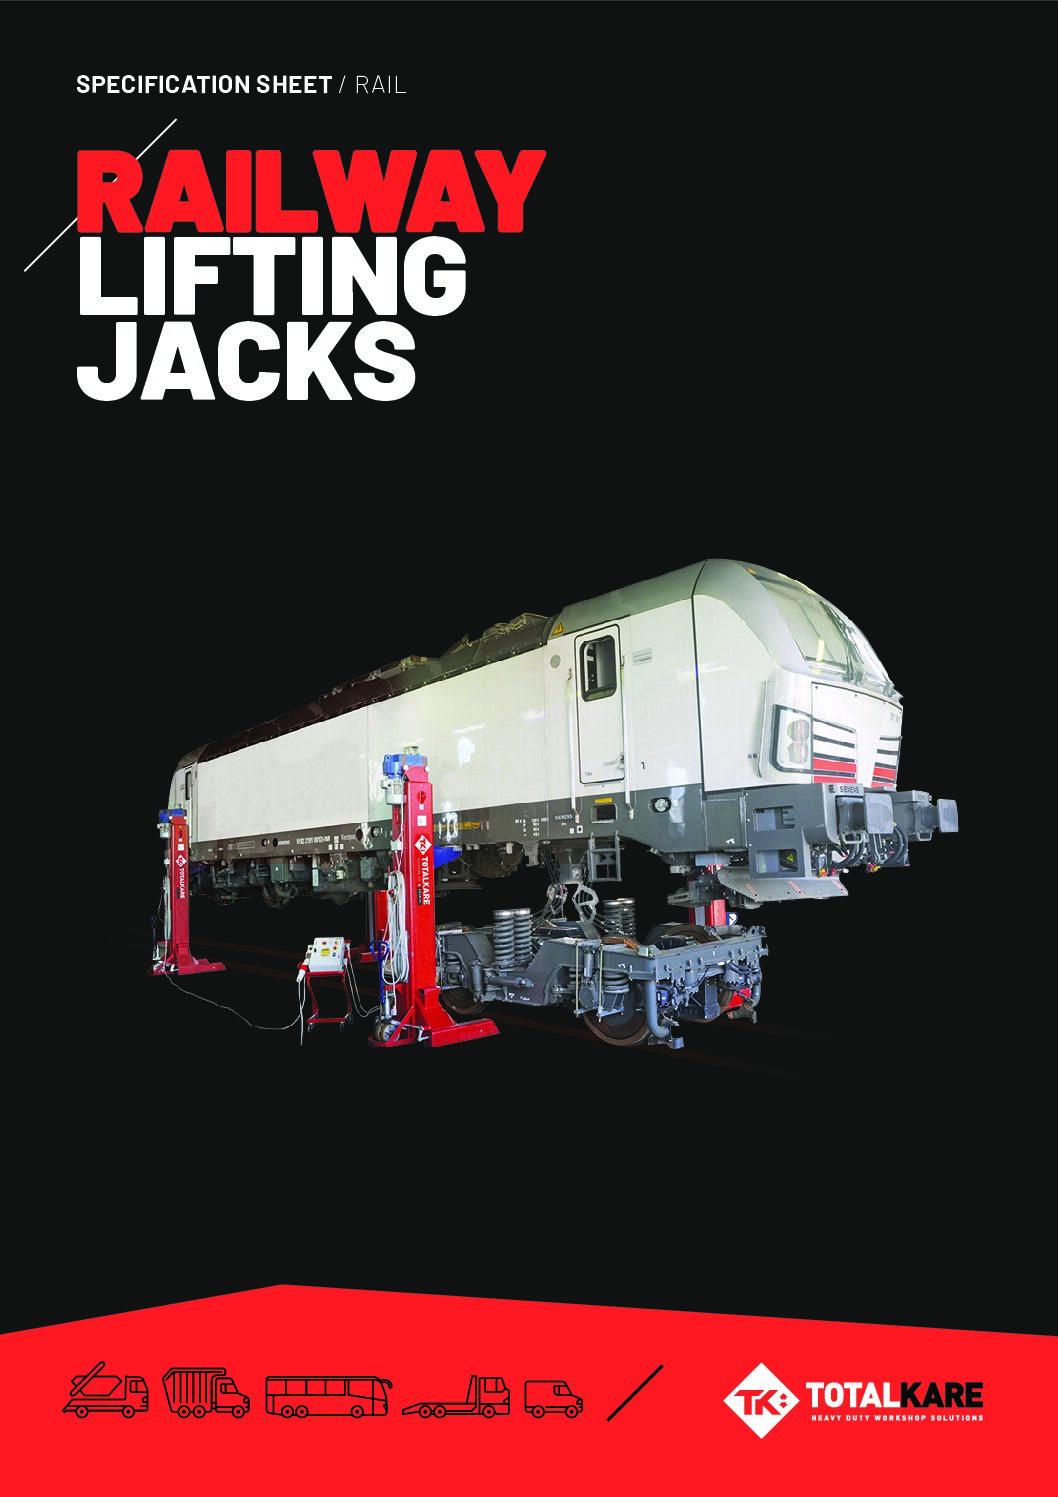 Totalkare Railway Lifting Jacks Specification Sheet